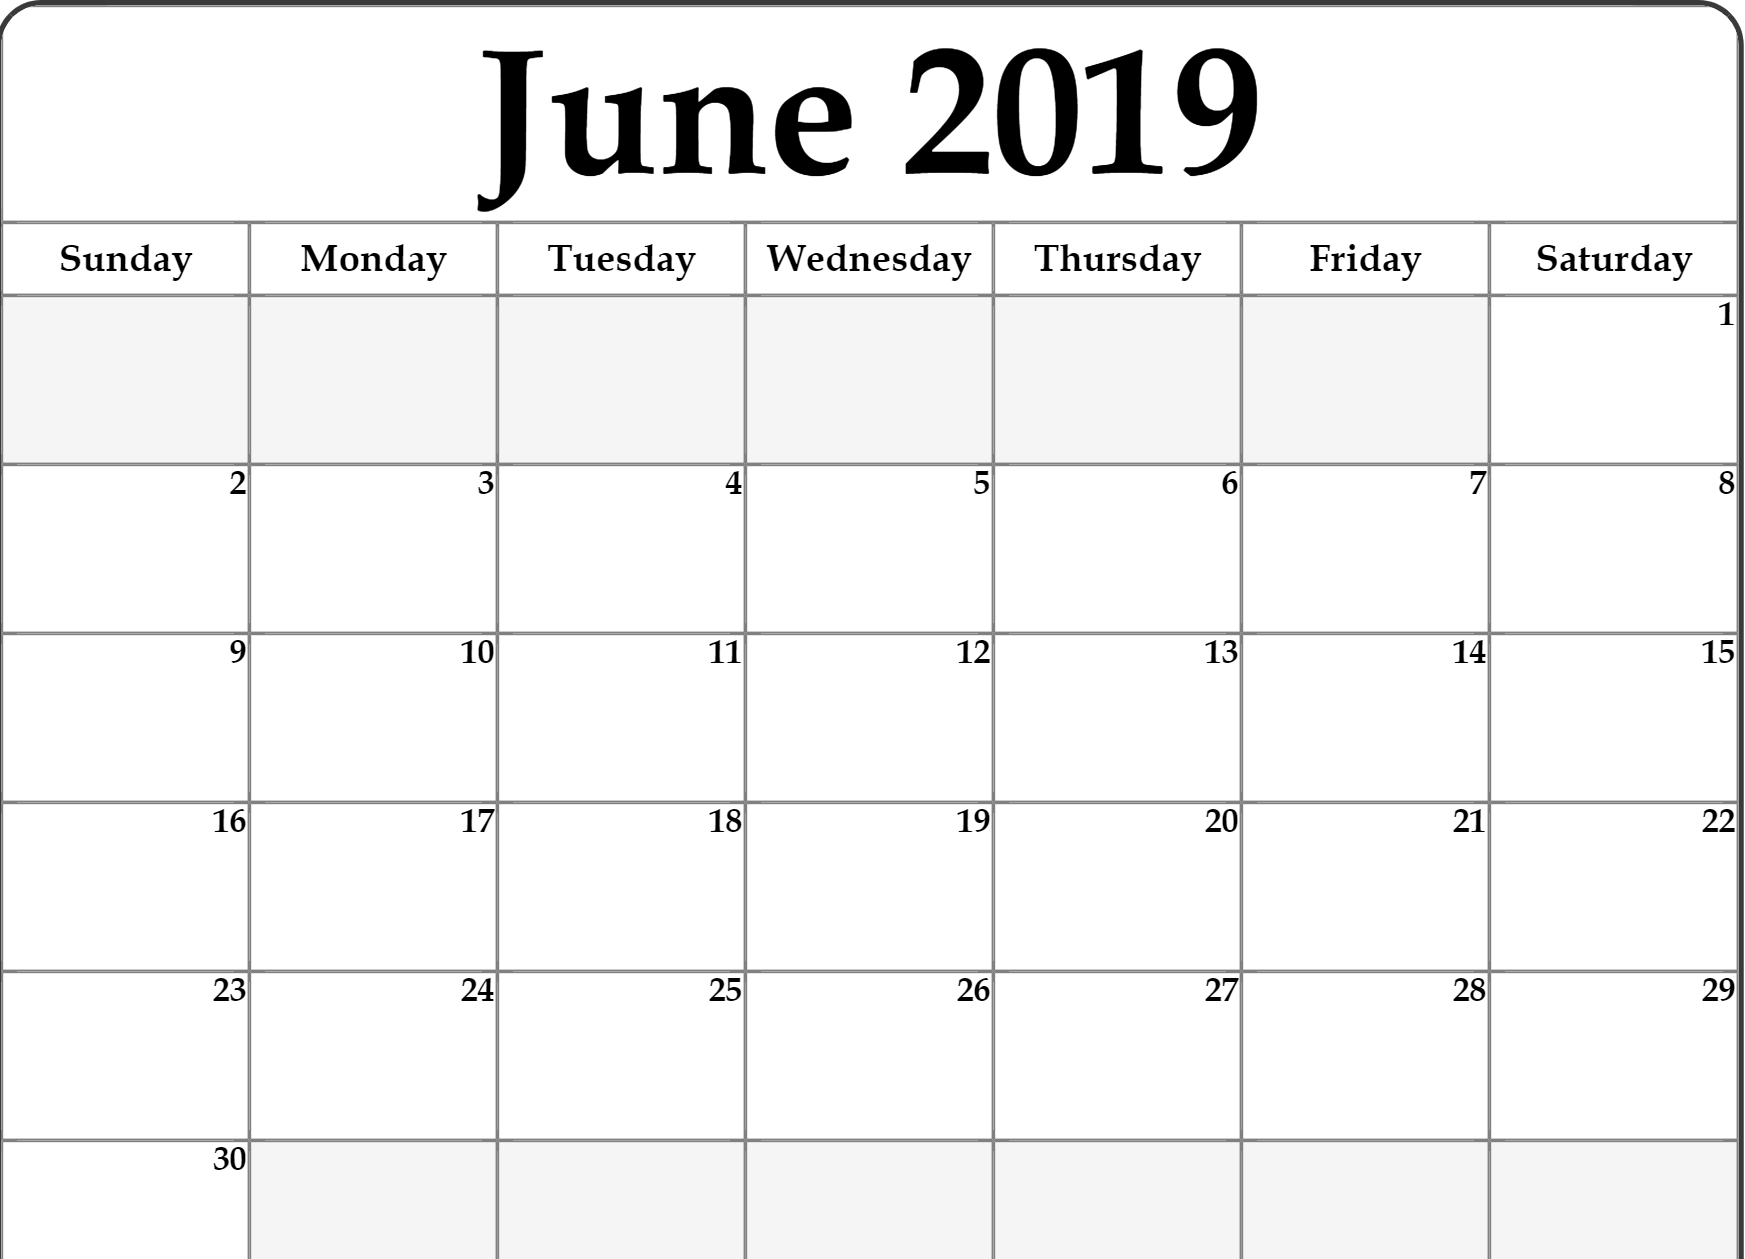 Lunar Calendar For June 2019 Printable Holidays Word Template inside Template For Lunar Calendar